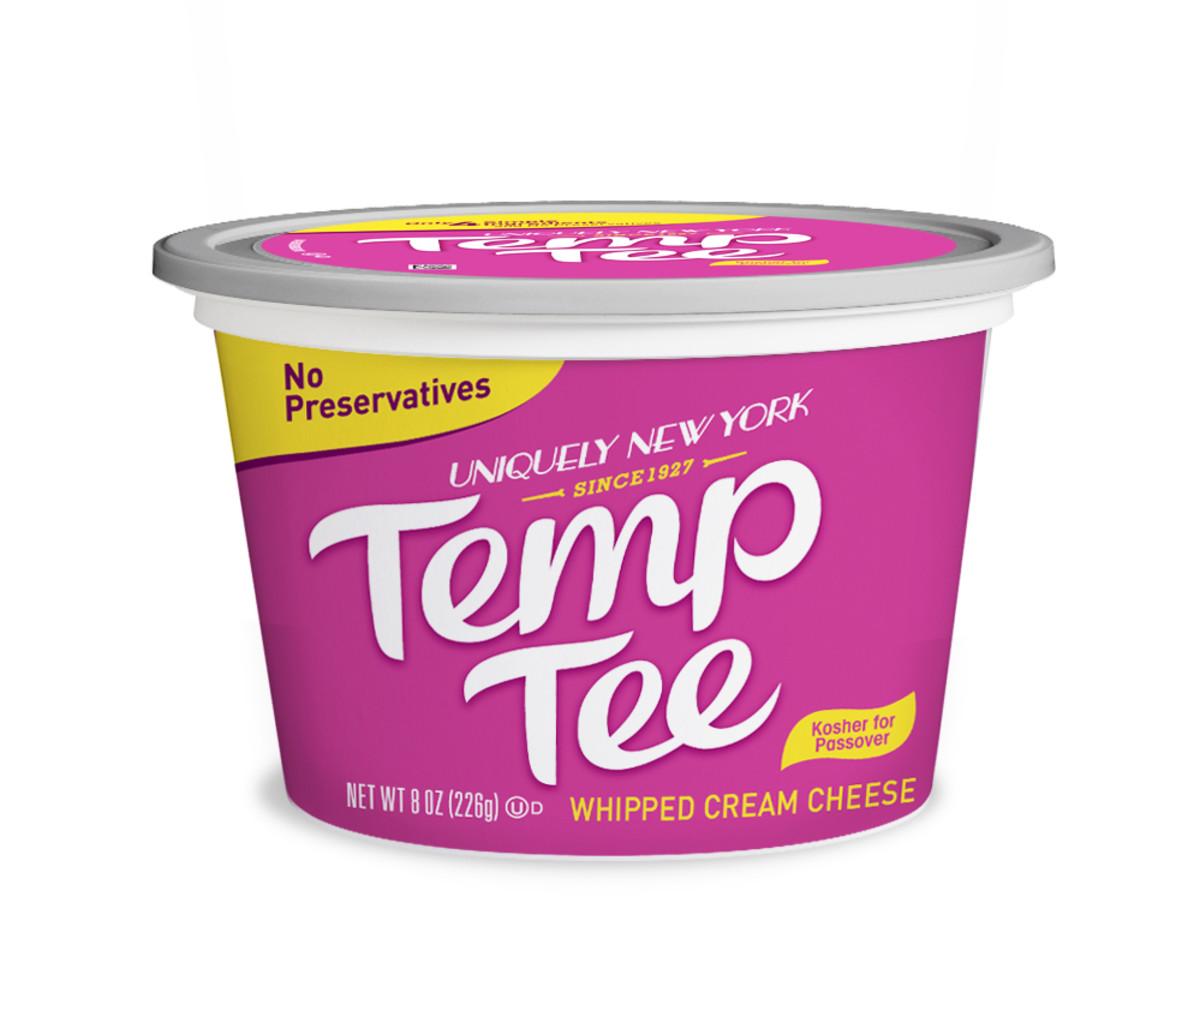 temp tee whipped cream cheese tub